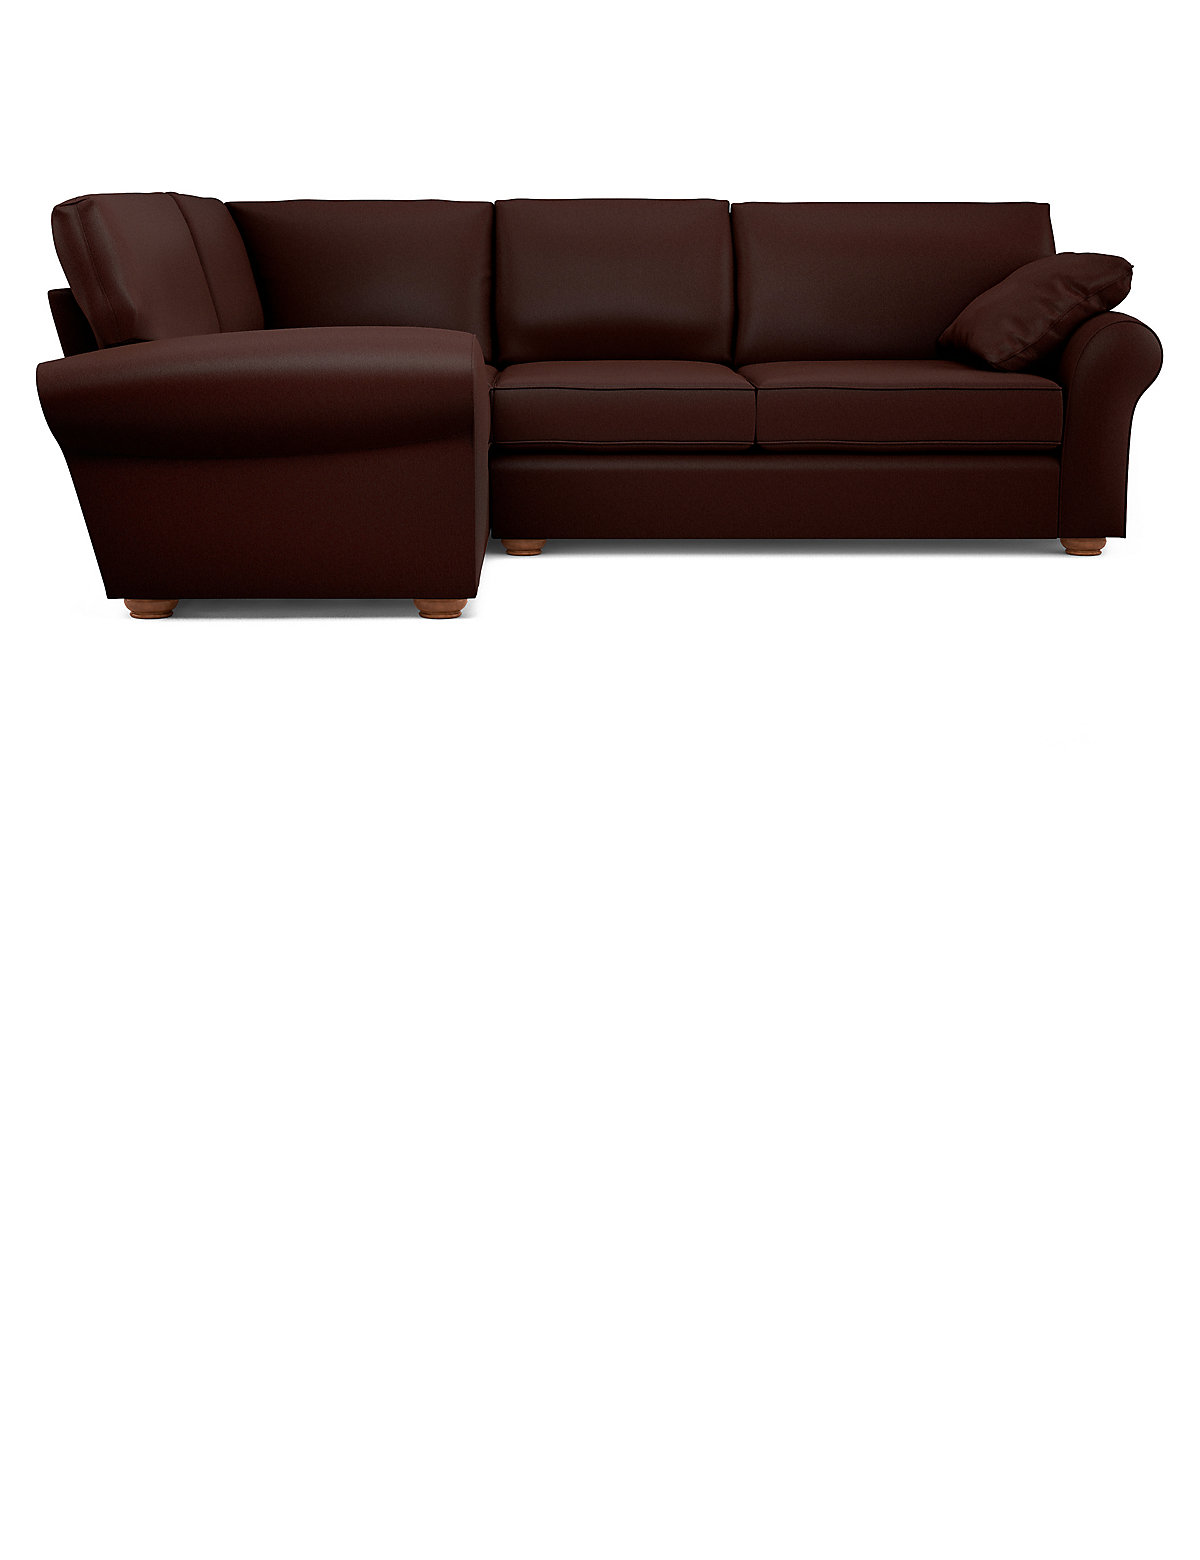 Marks and spencer ramsden small corner sofa left hand Low corner sofa